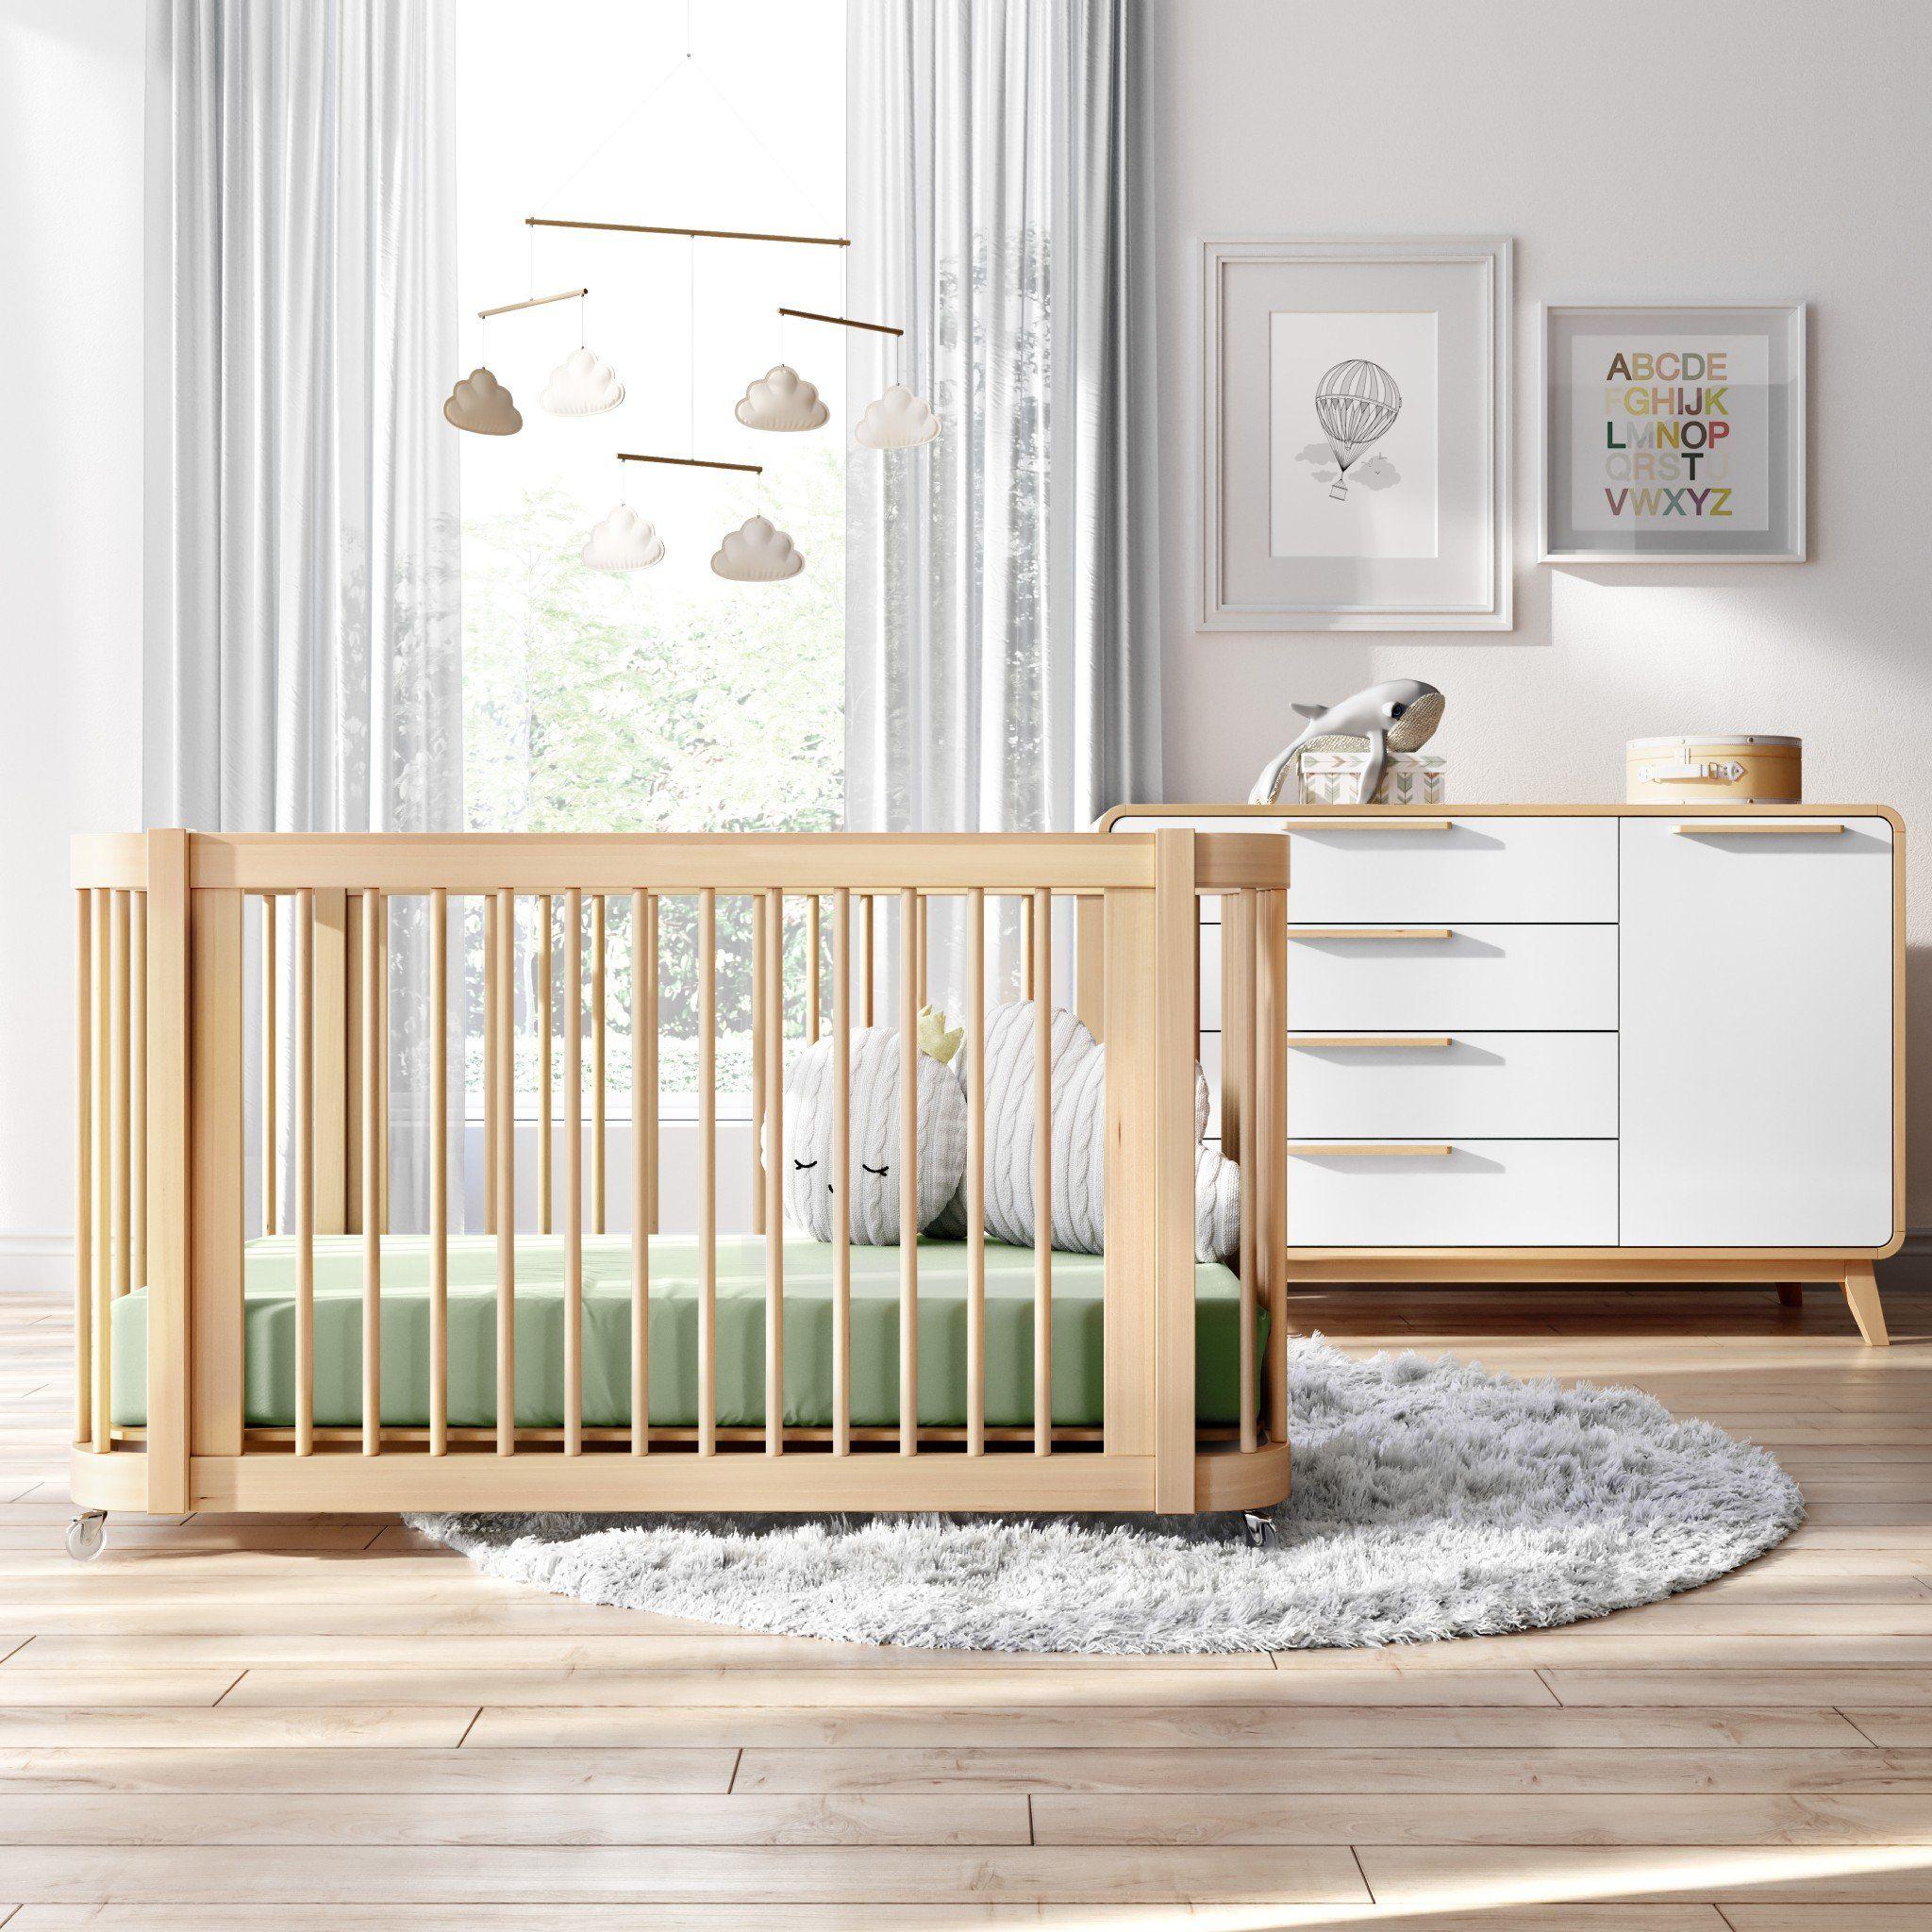 The Wave Crib Natural Wood Modern Convertible Mini Crib And Full Crib With Toddler Bed Nestig In 2020 Cribs Nursery Style Mini Crib